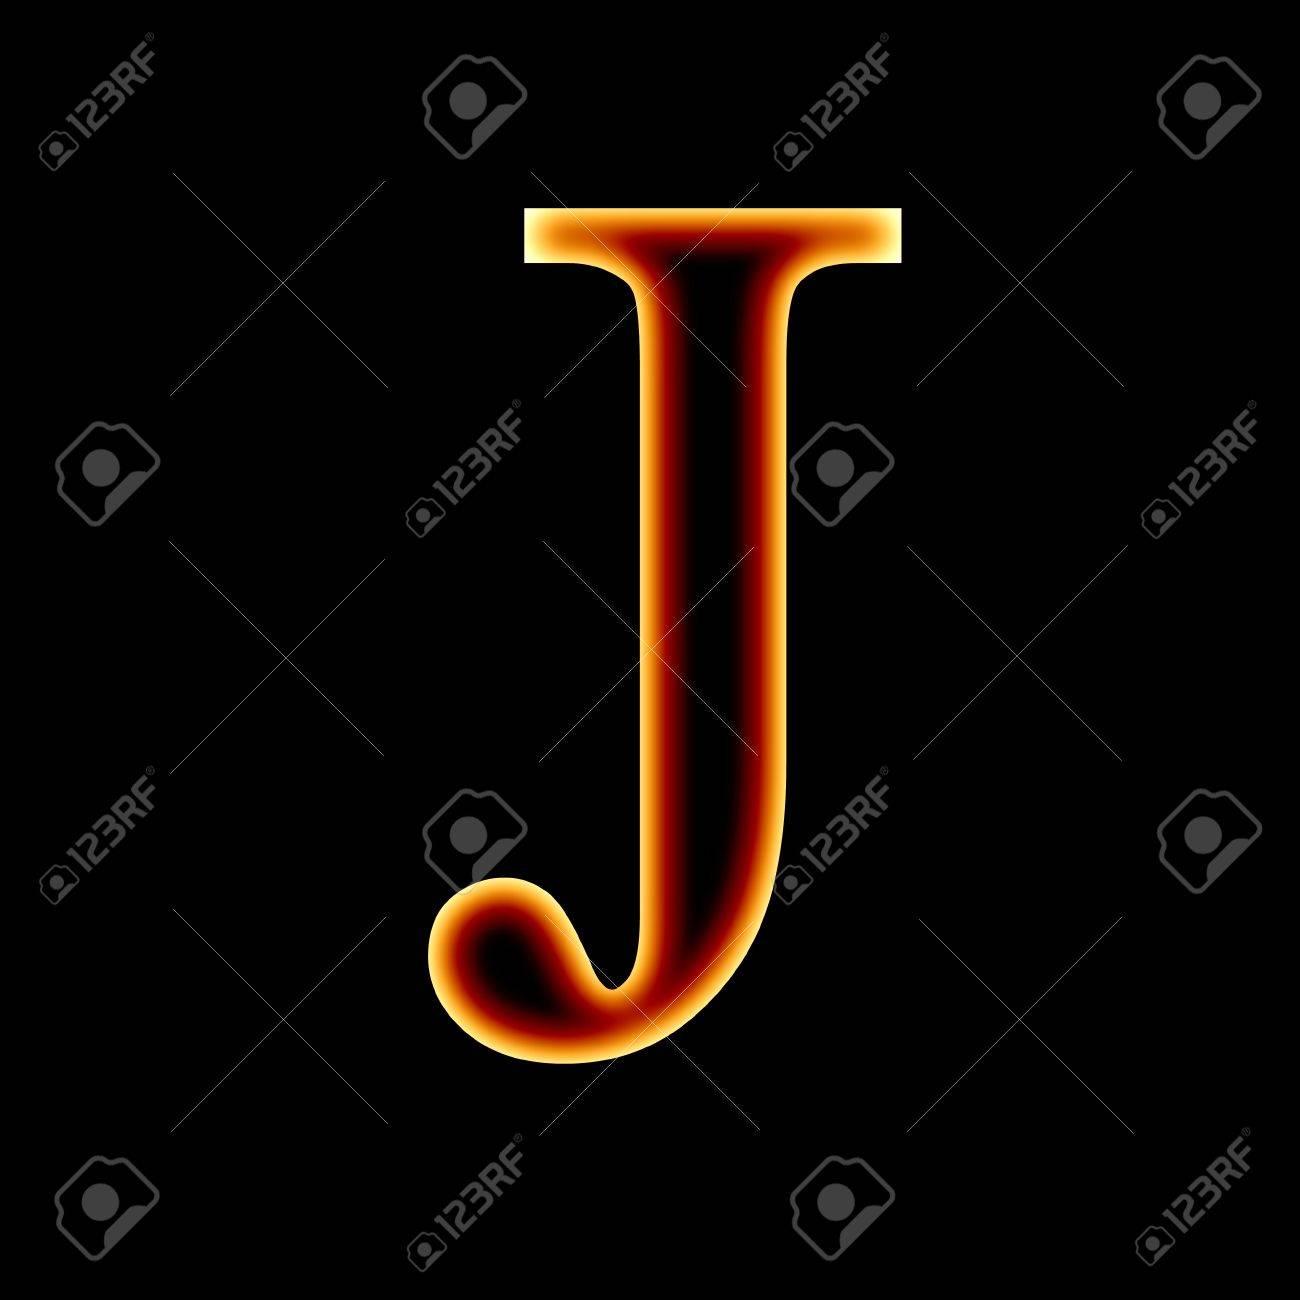 Fire Font Letter J On A Dark Background